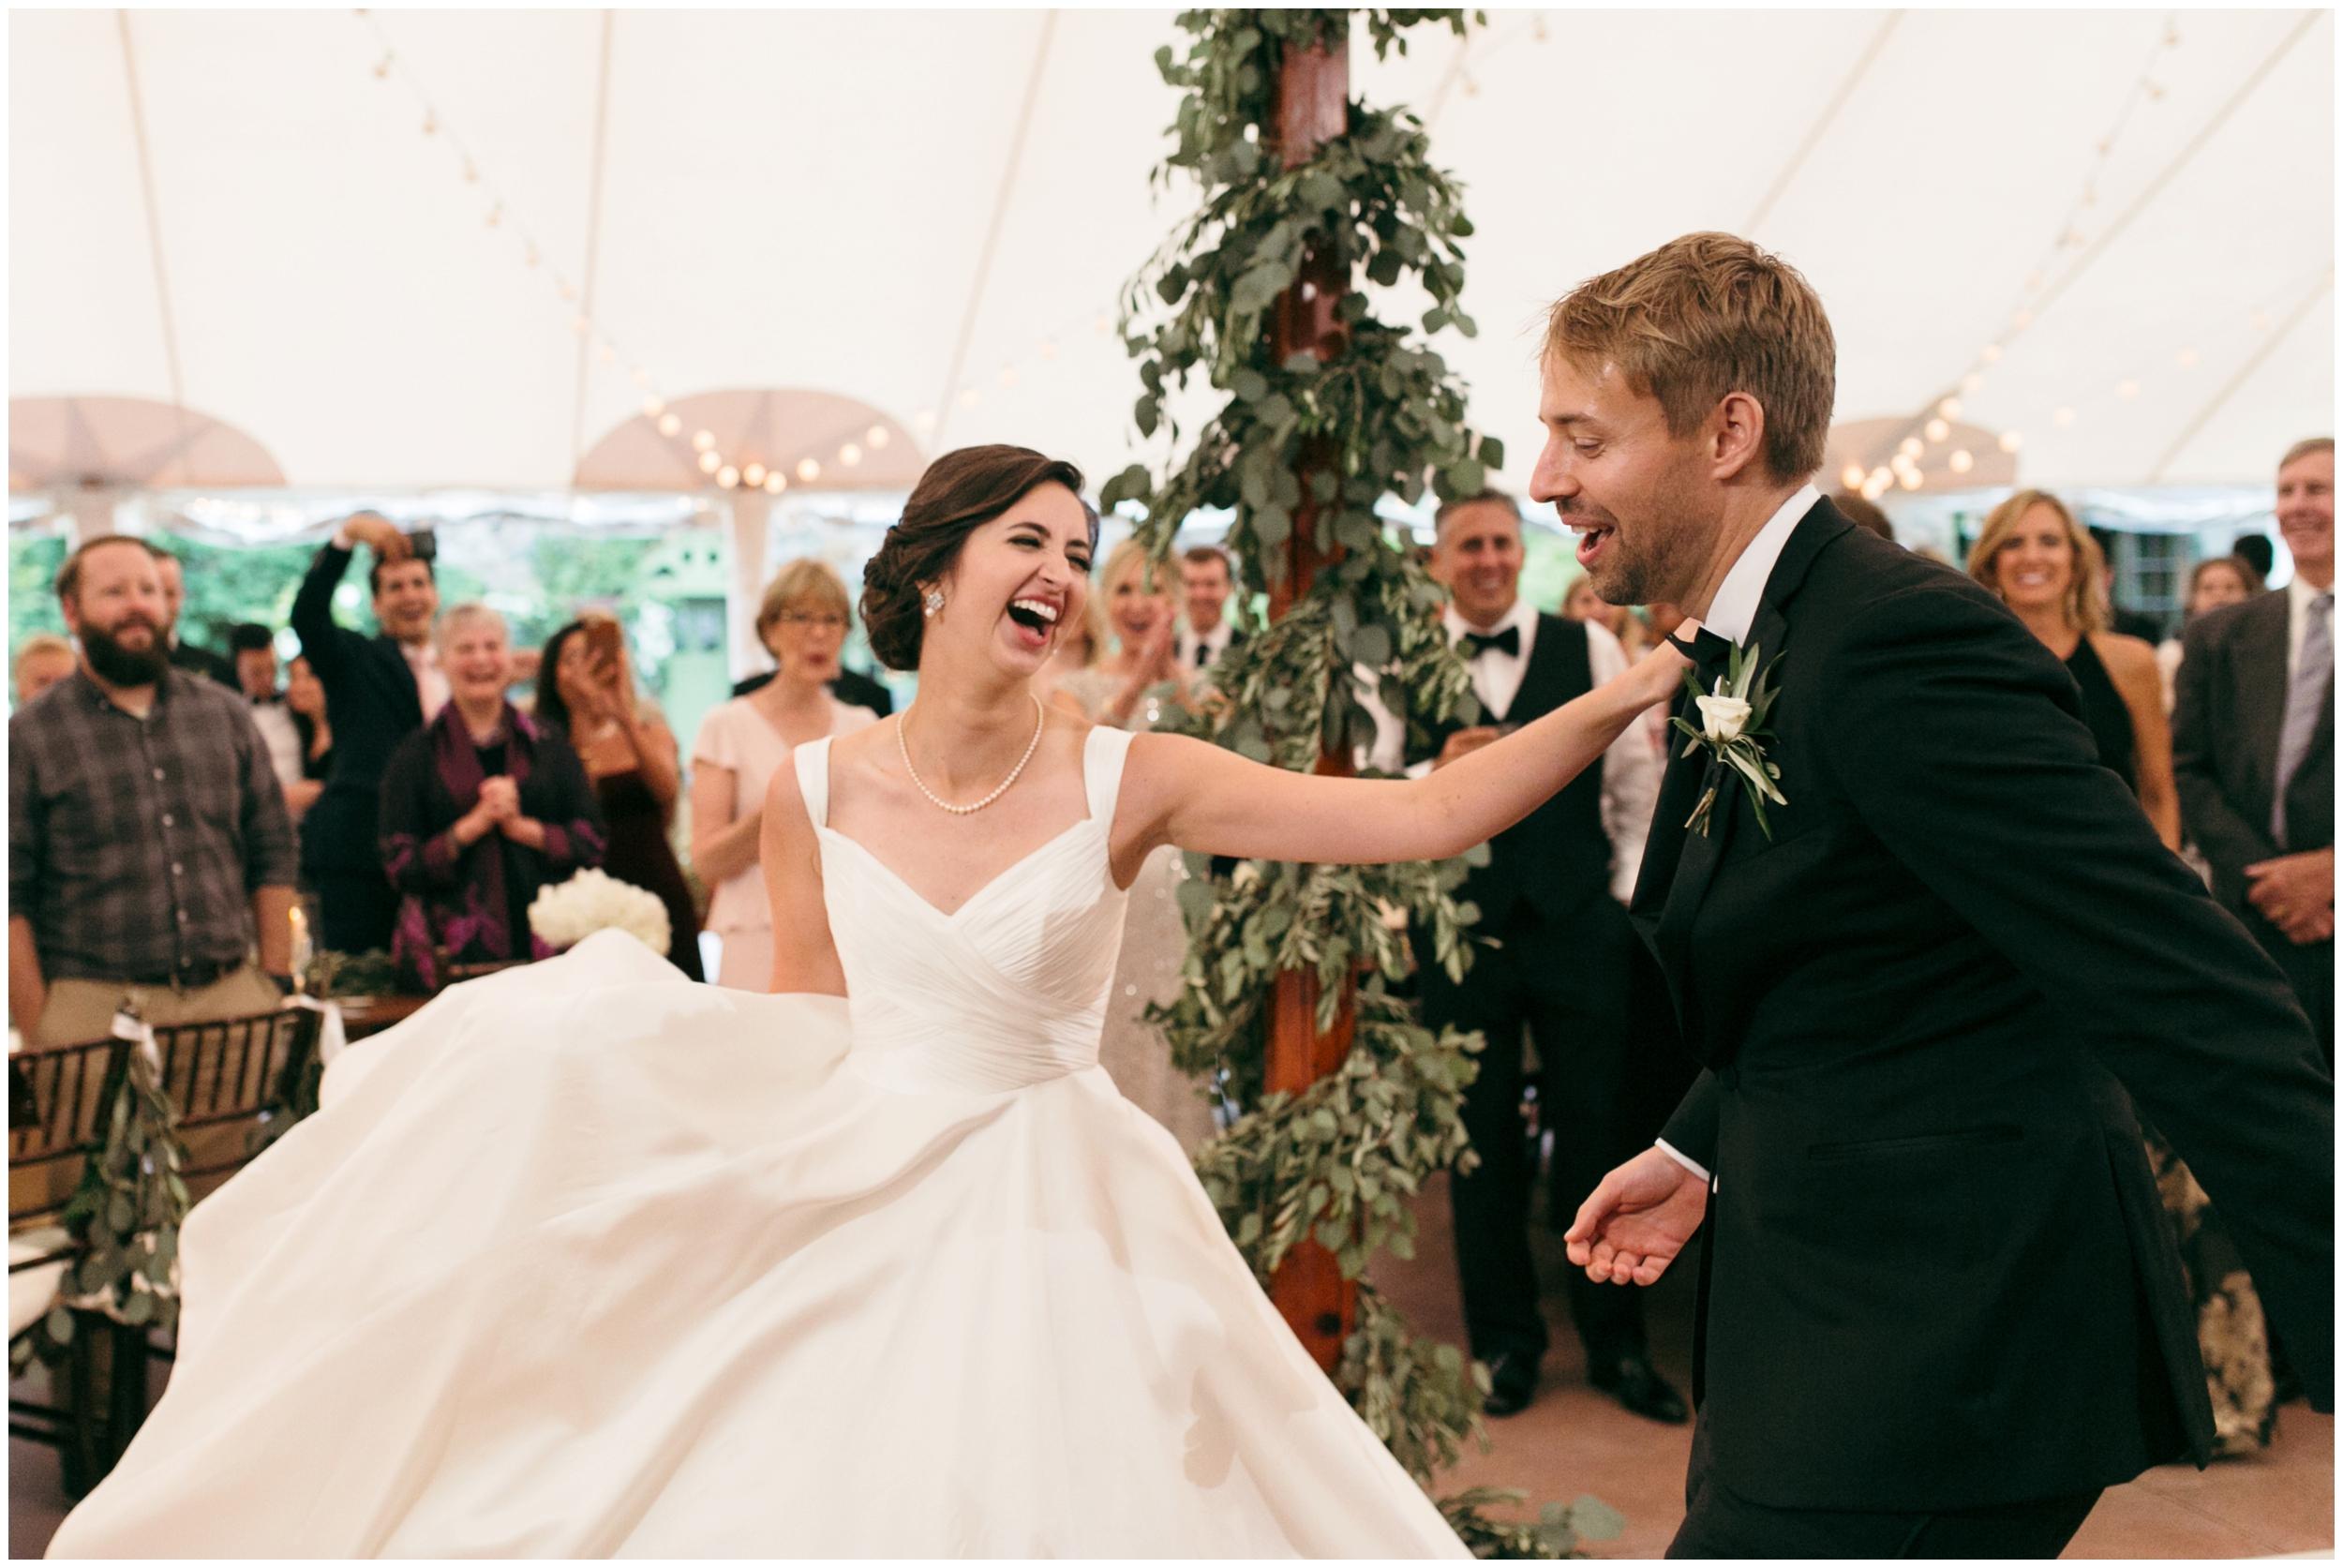 Willowdale-Estate-Wedding-Bailey-Q-Photo-Boston-Wedding-Photographer-079.JPG